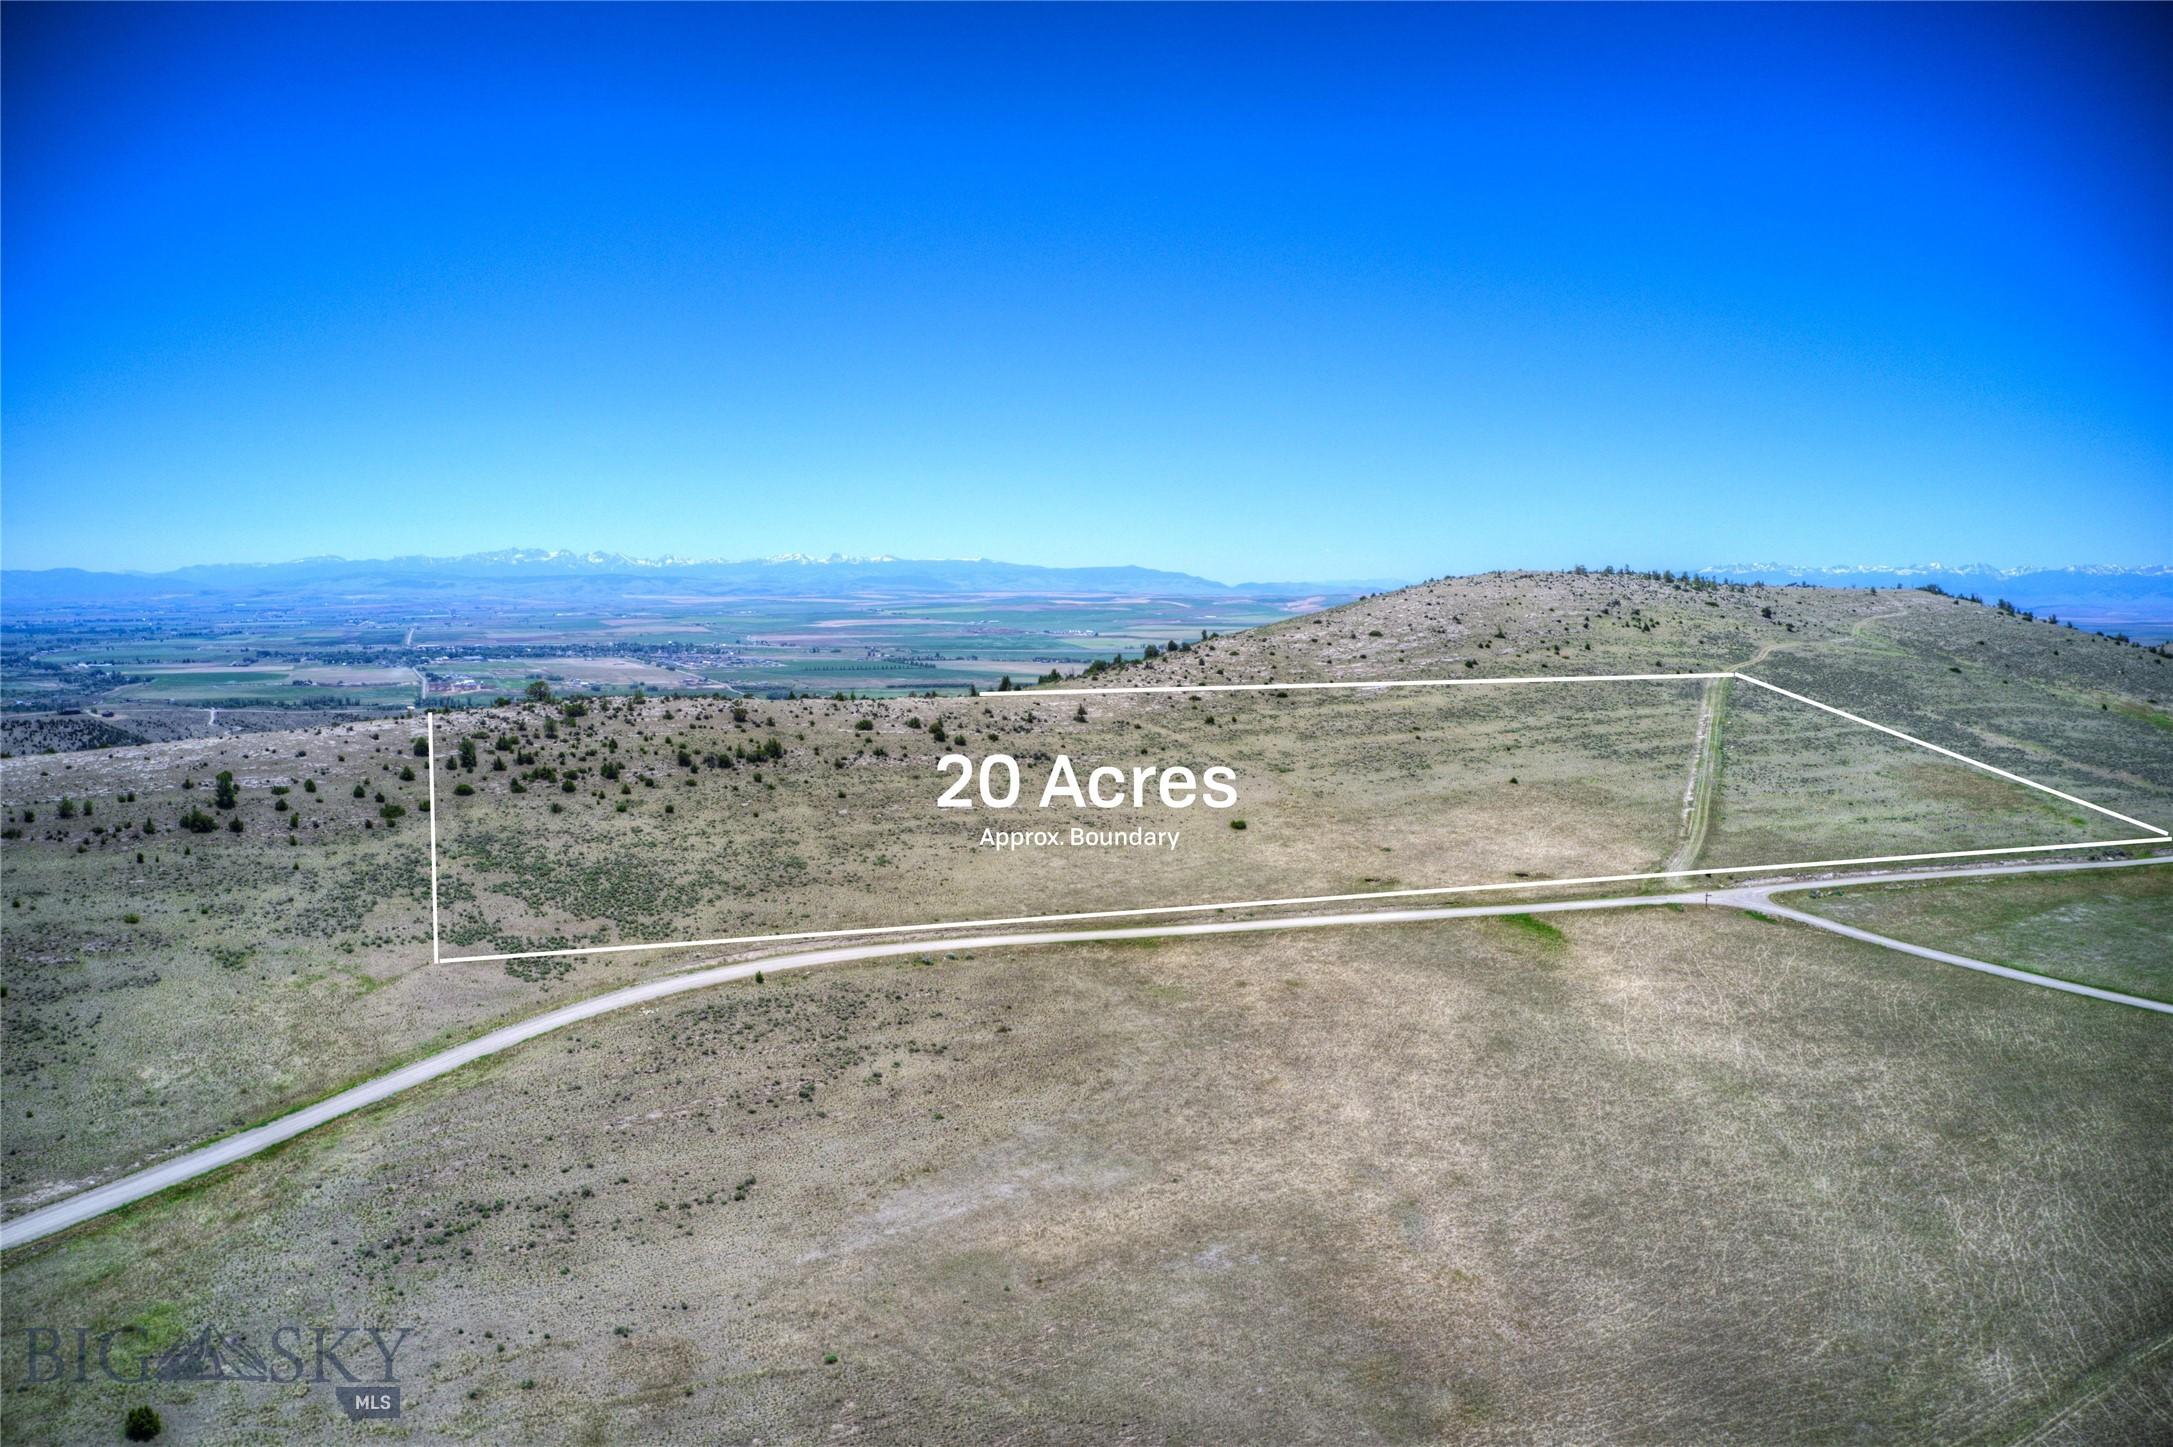 Tbd Lot 147 Reservoir Cutoff Rd Property Photo 1